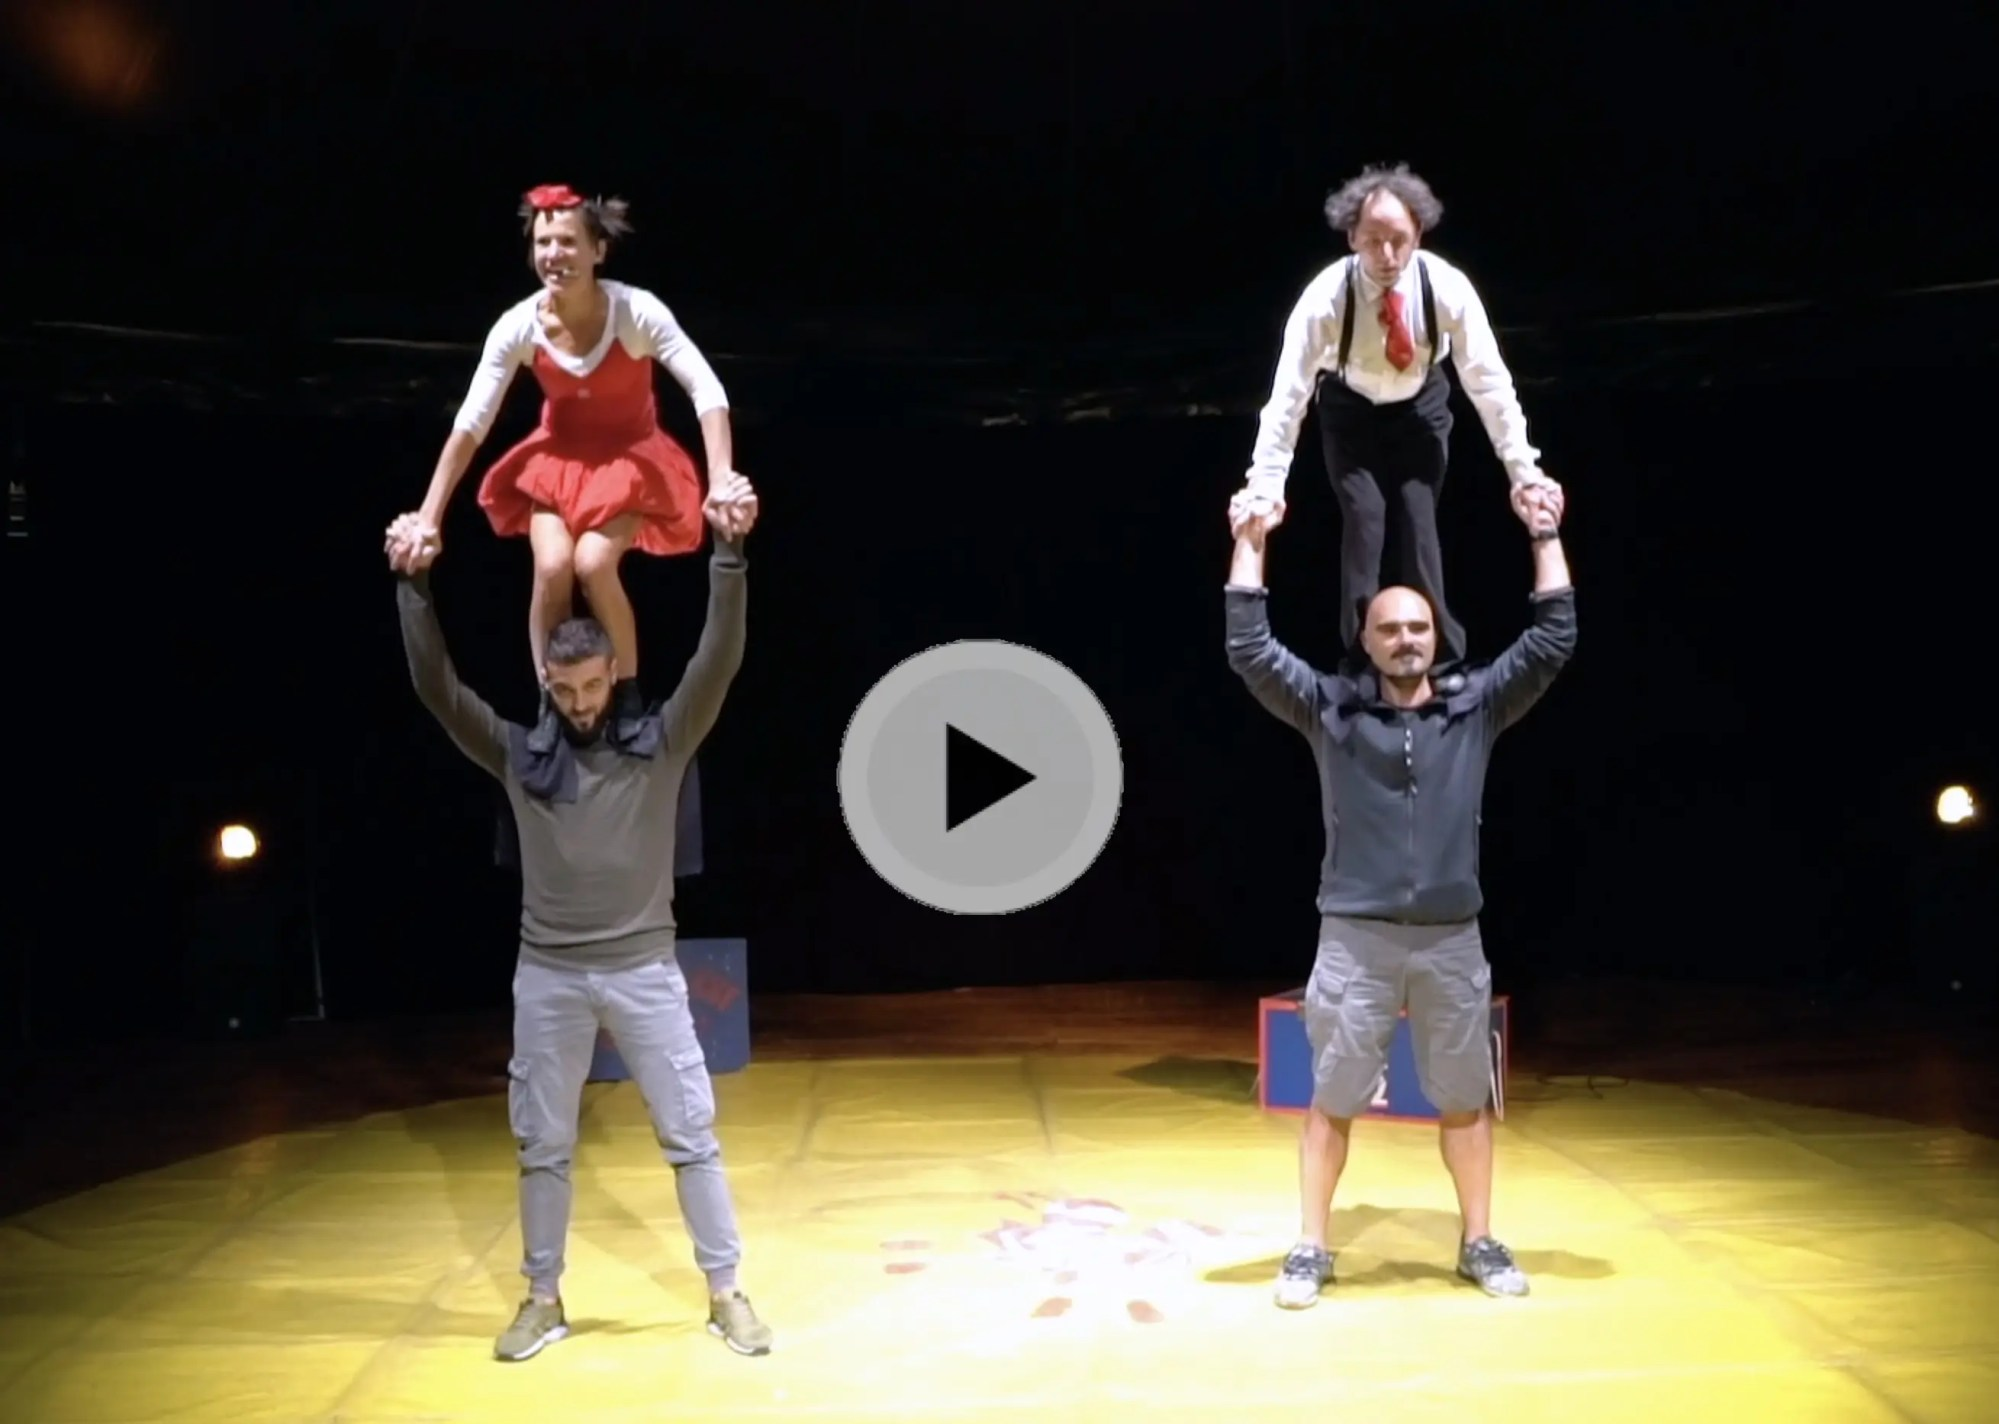 Nanirossi Show promo 2019